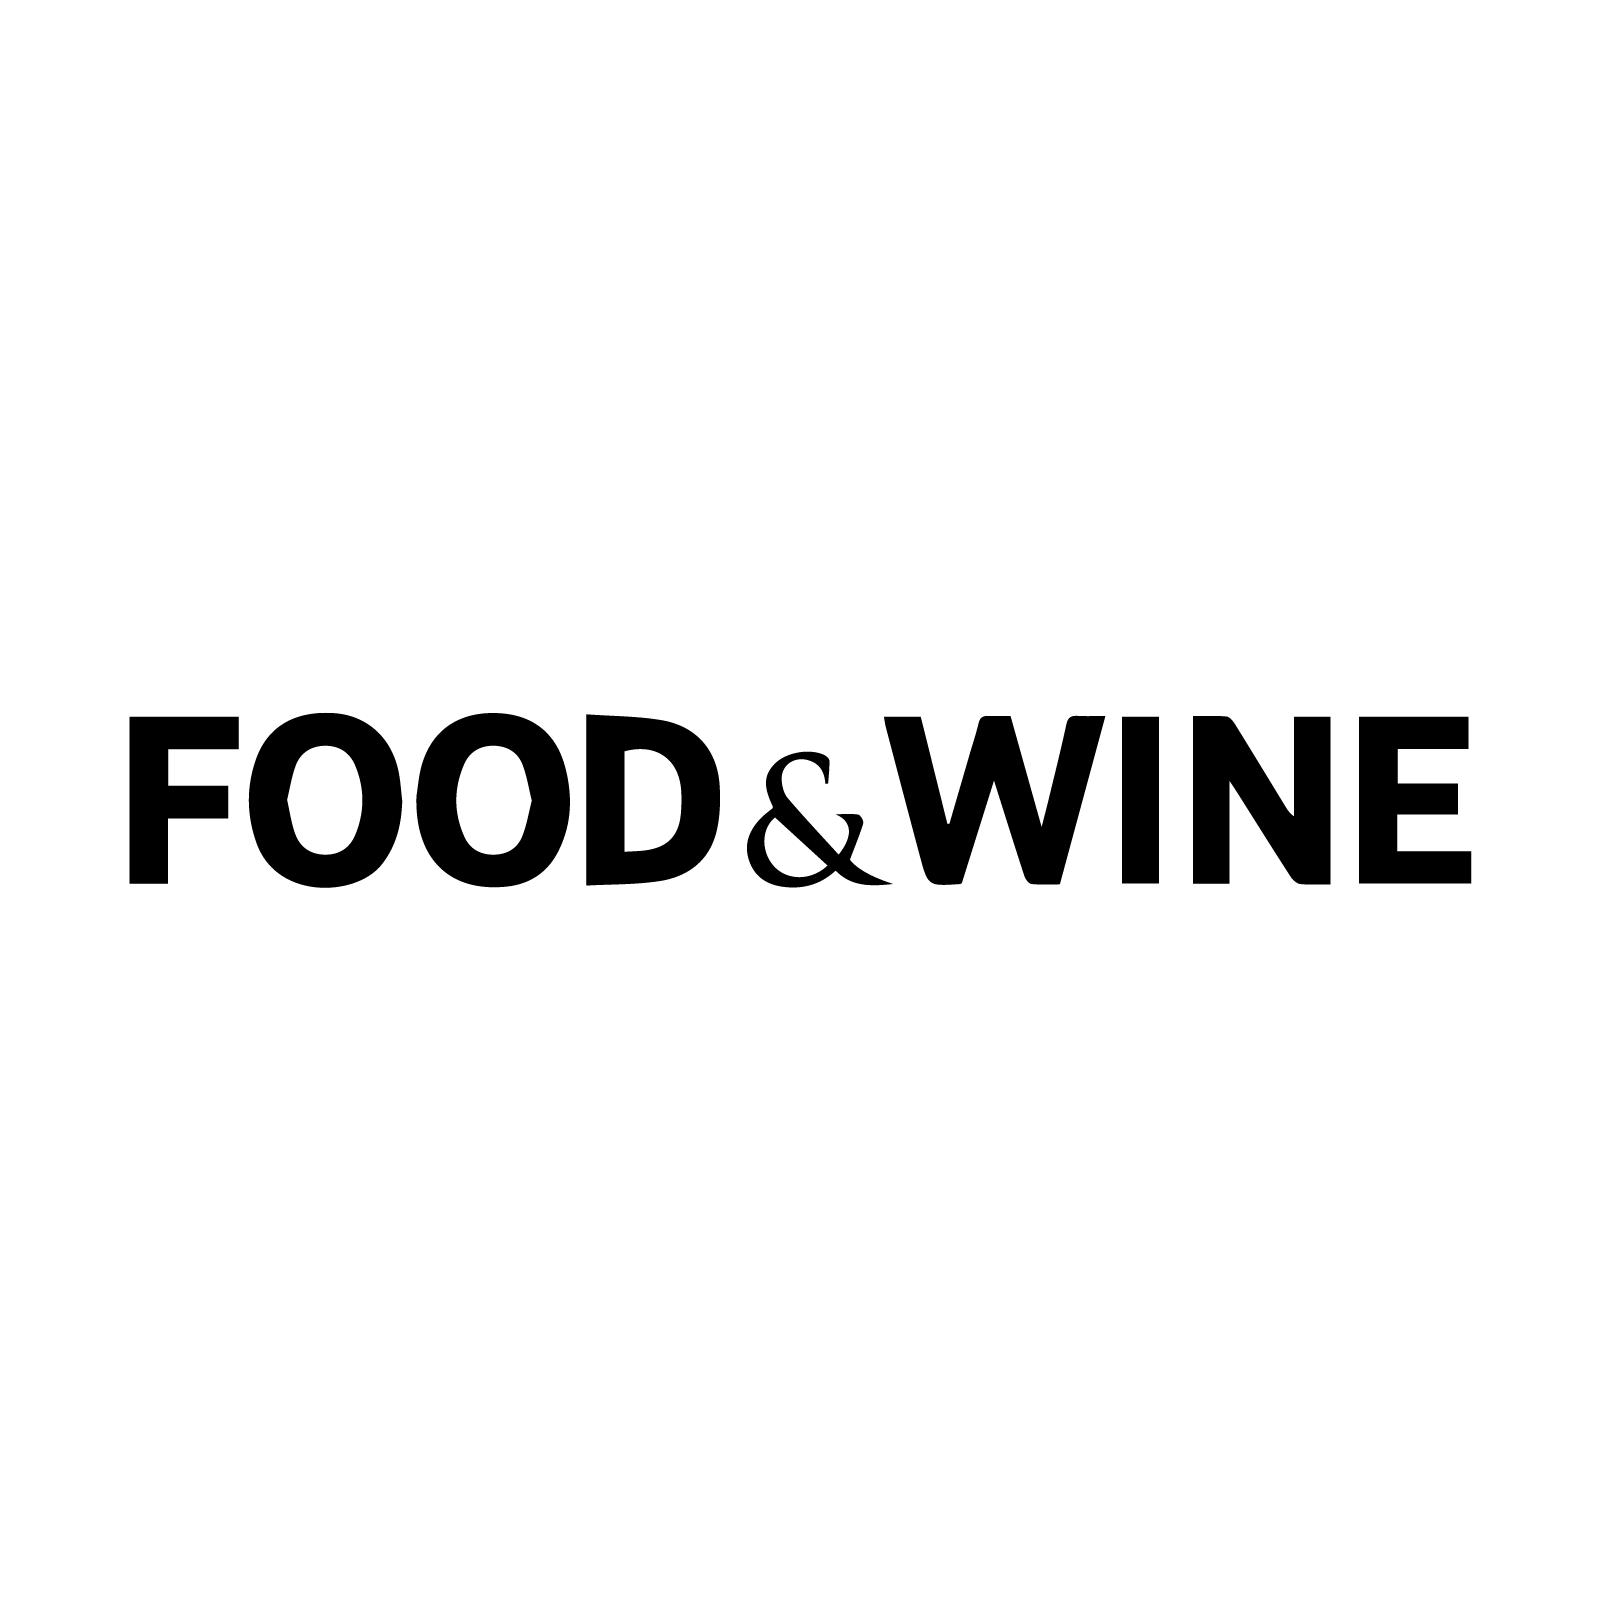 Press Logos_Food & Wine.png